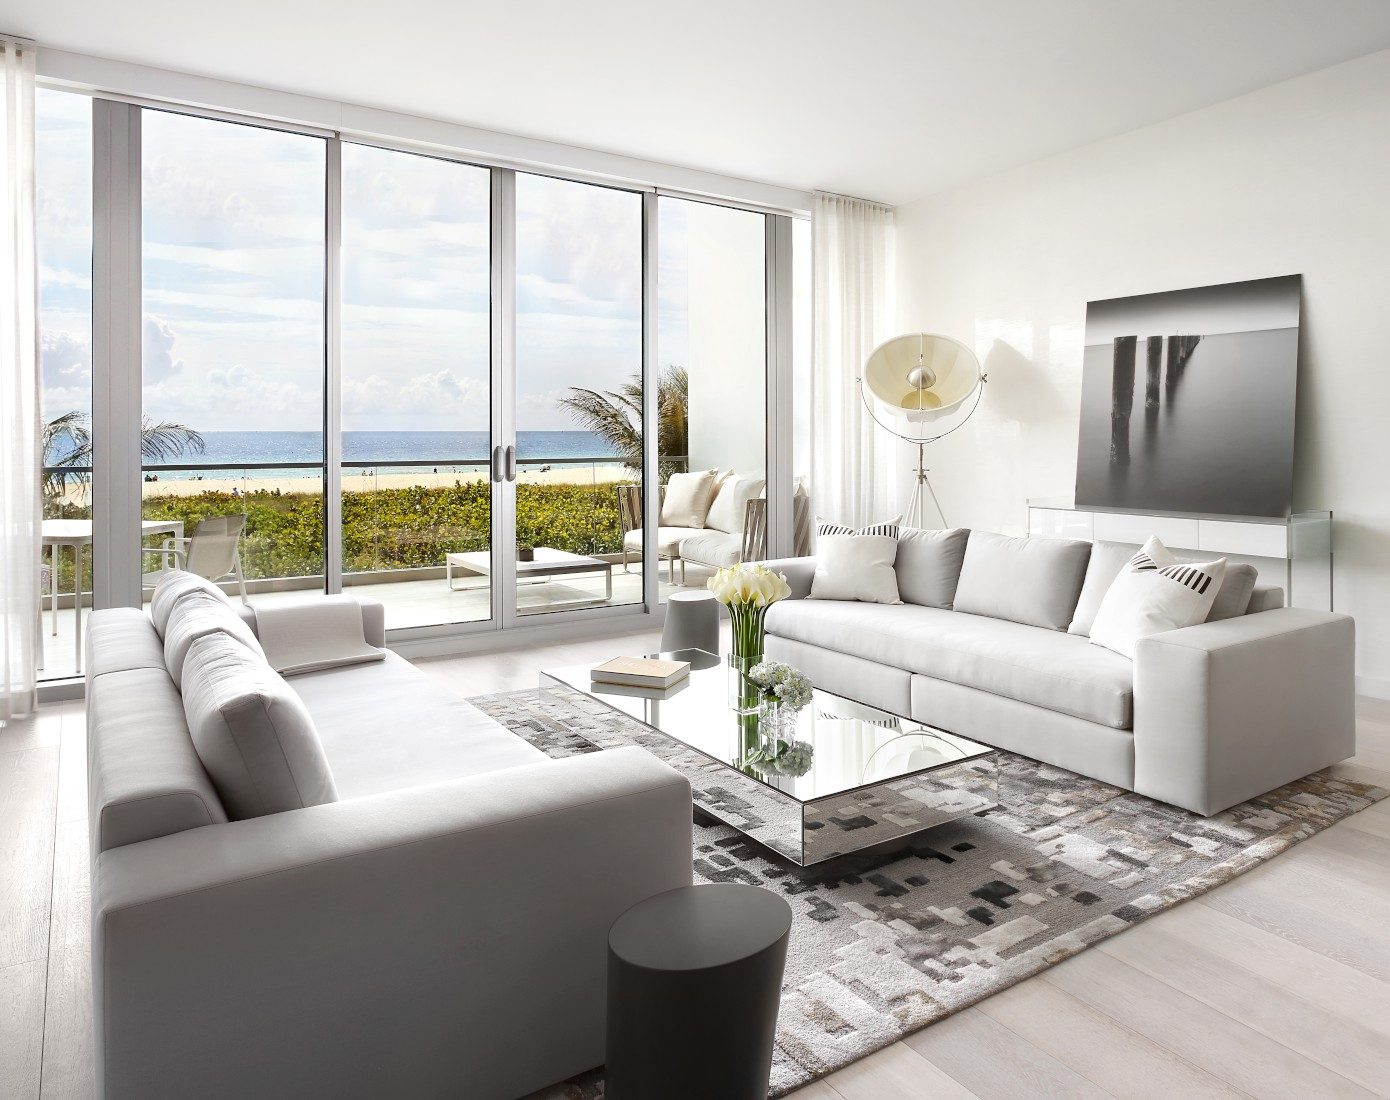 Miami Beach Villa by Associated Design « HomeAdore